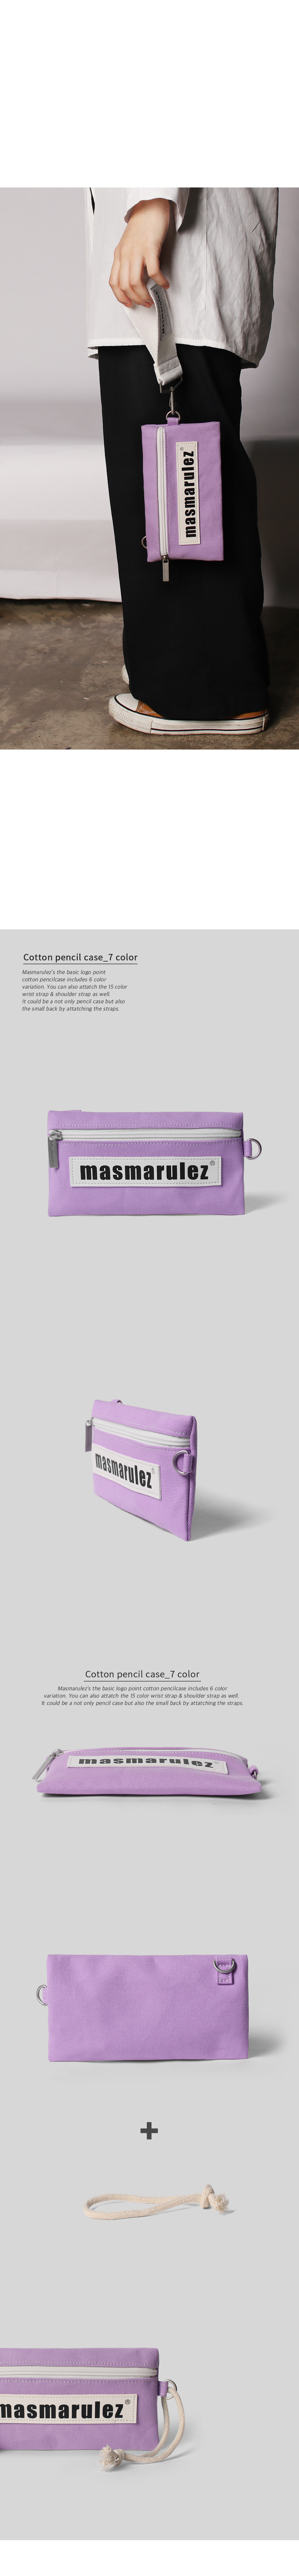 purple-d2.jpg